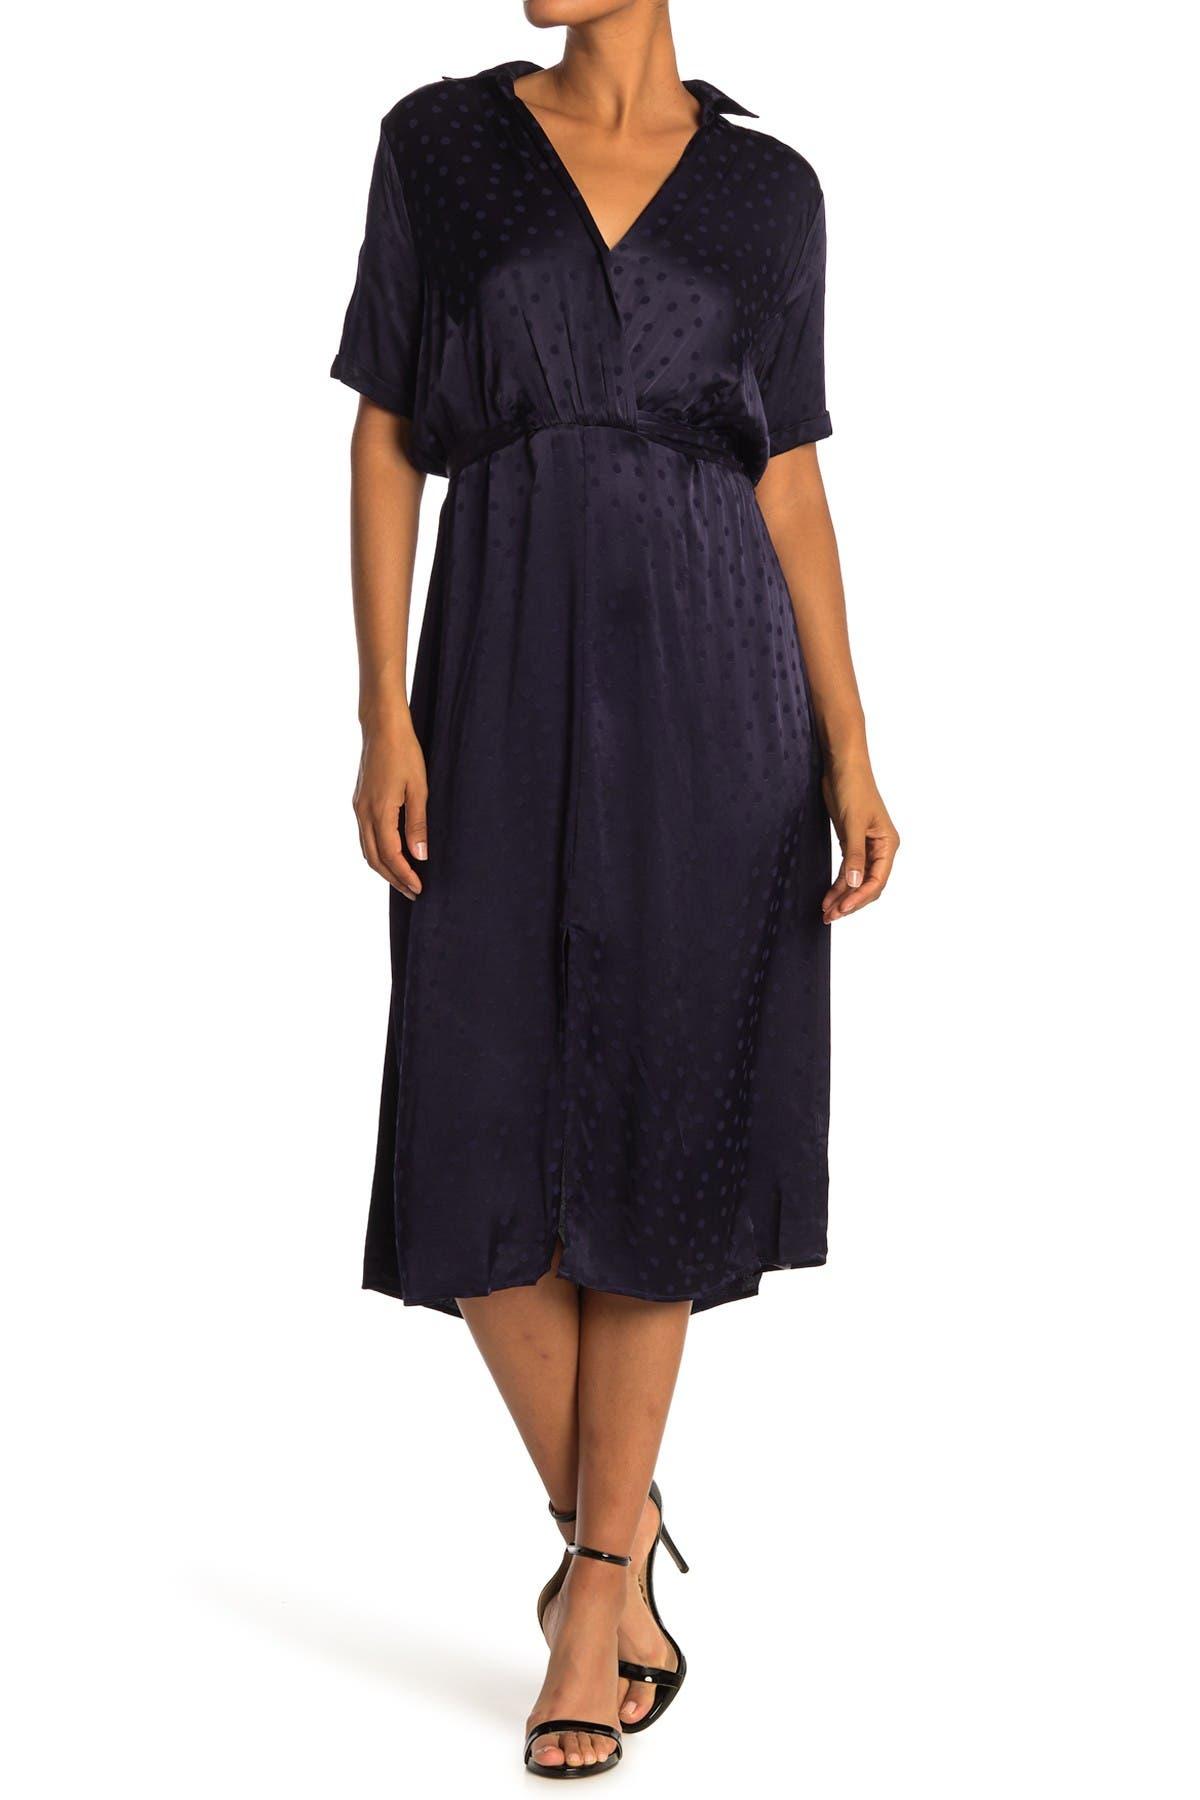 Image of Love Stitch Satin Polka Dot Midi Dress